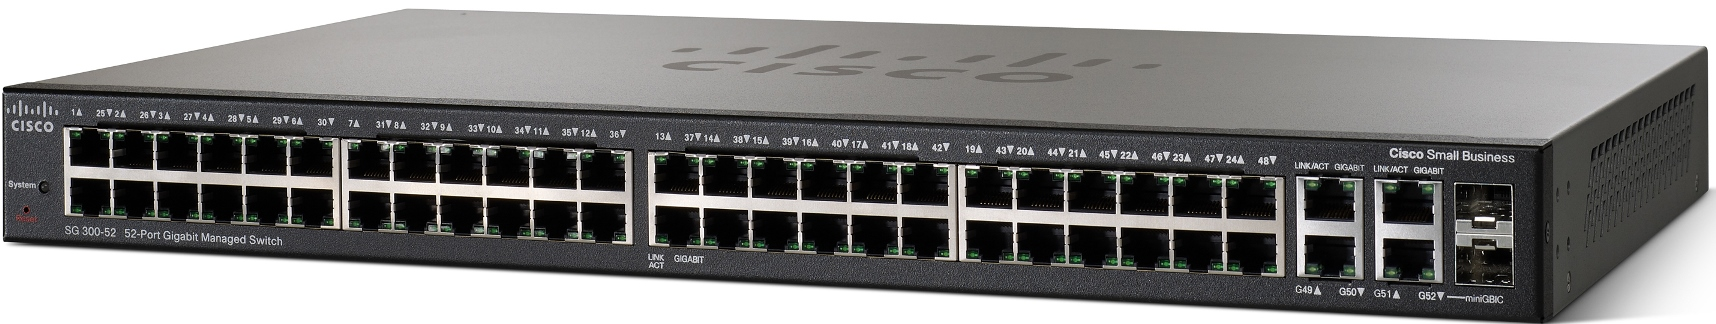 Cisco SG300-52, 50xGigabit + 2x SFP Switch